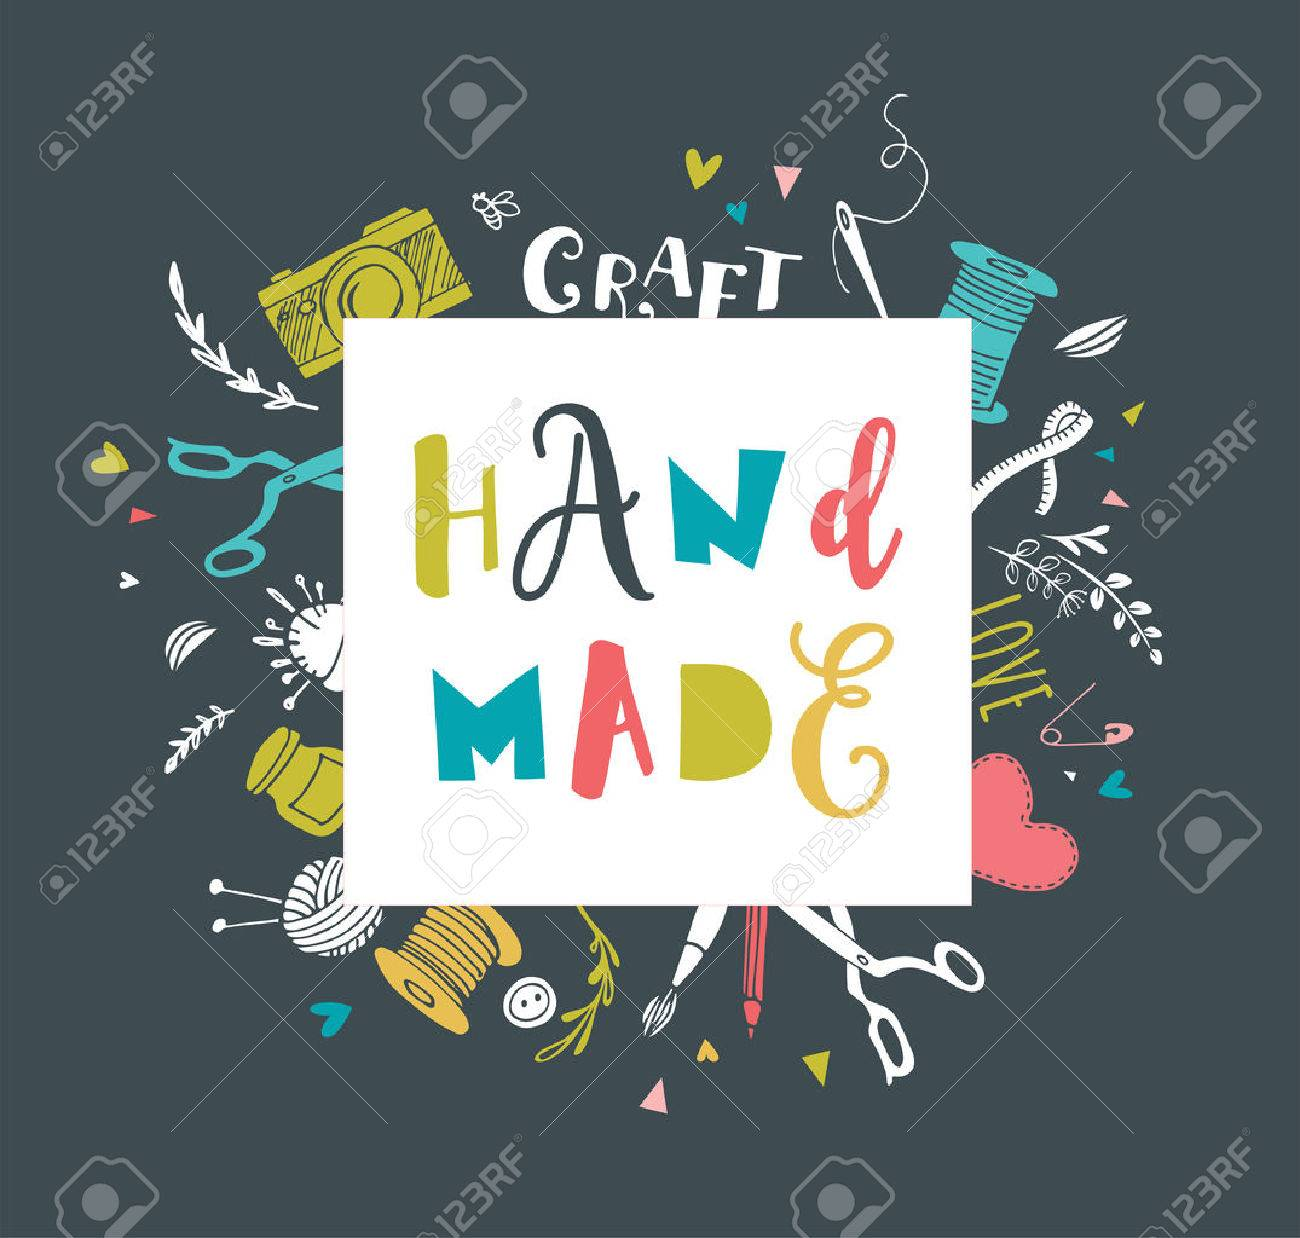 Handmade Crafts Workshop Art Fair And Festival Poster Flyer